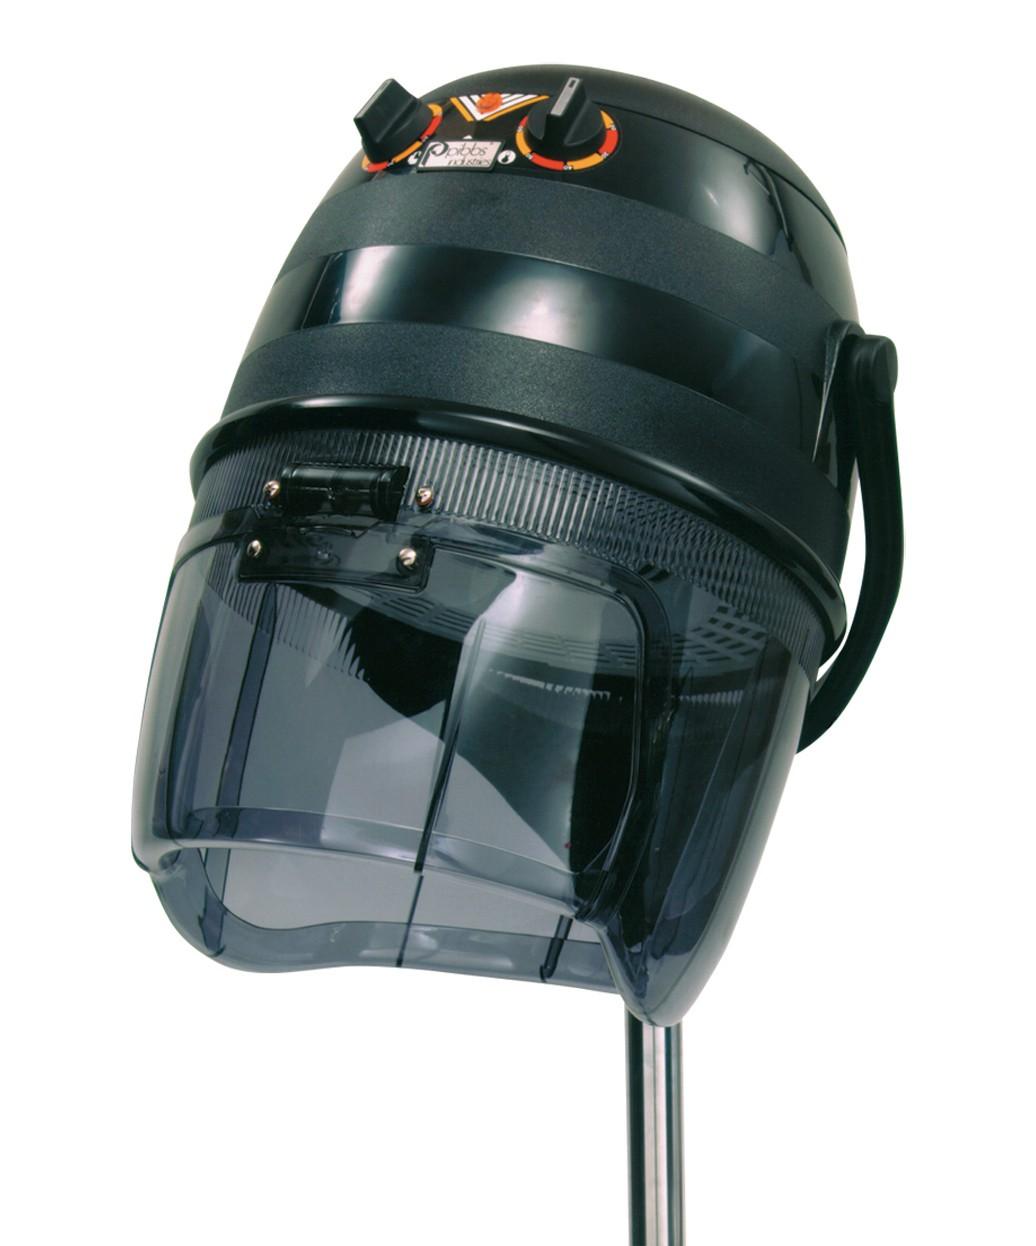 Pibbs 514 Kwik Dryer on Casters